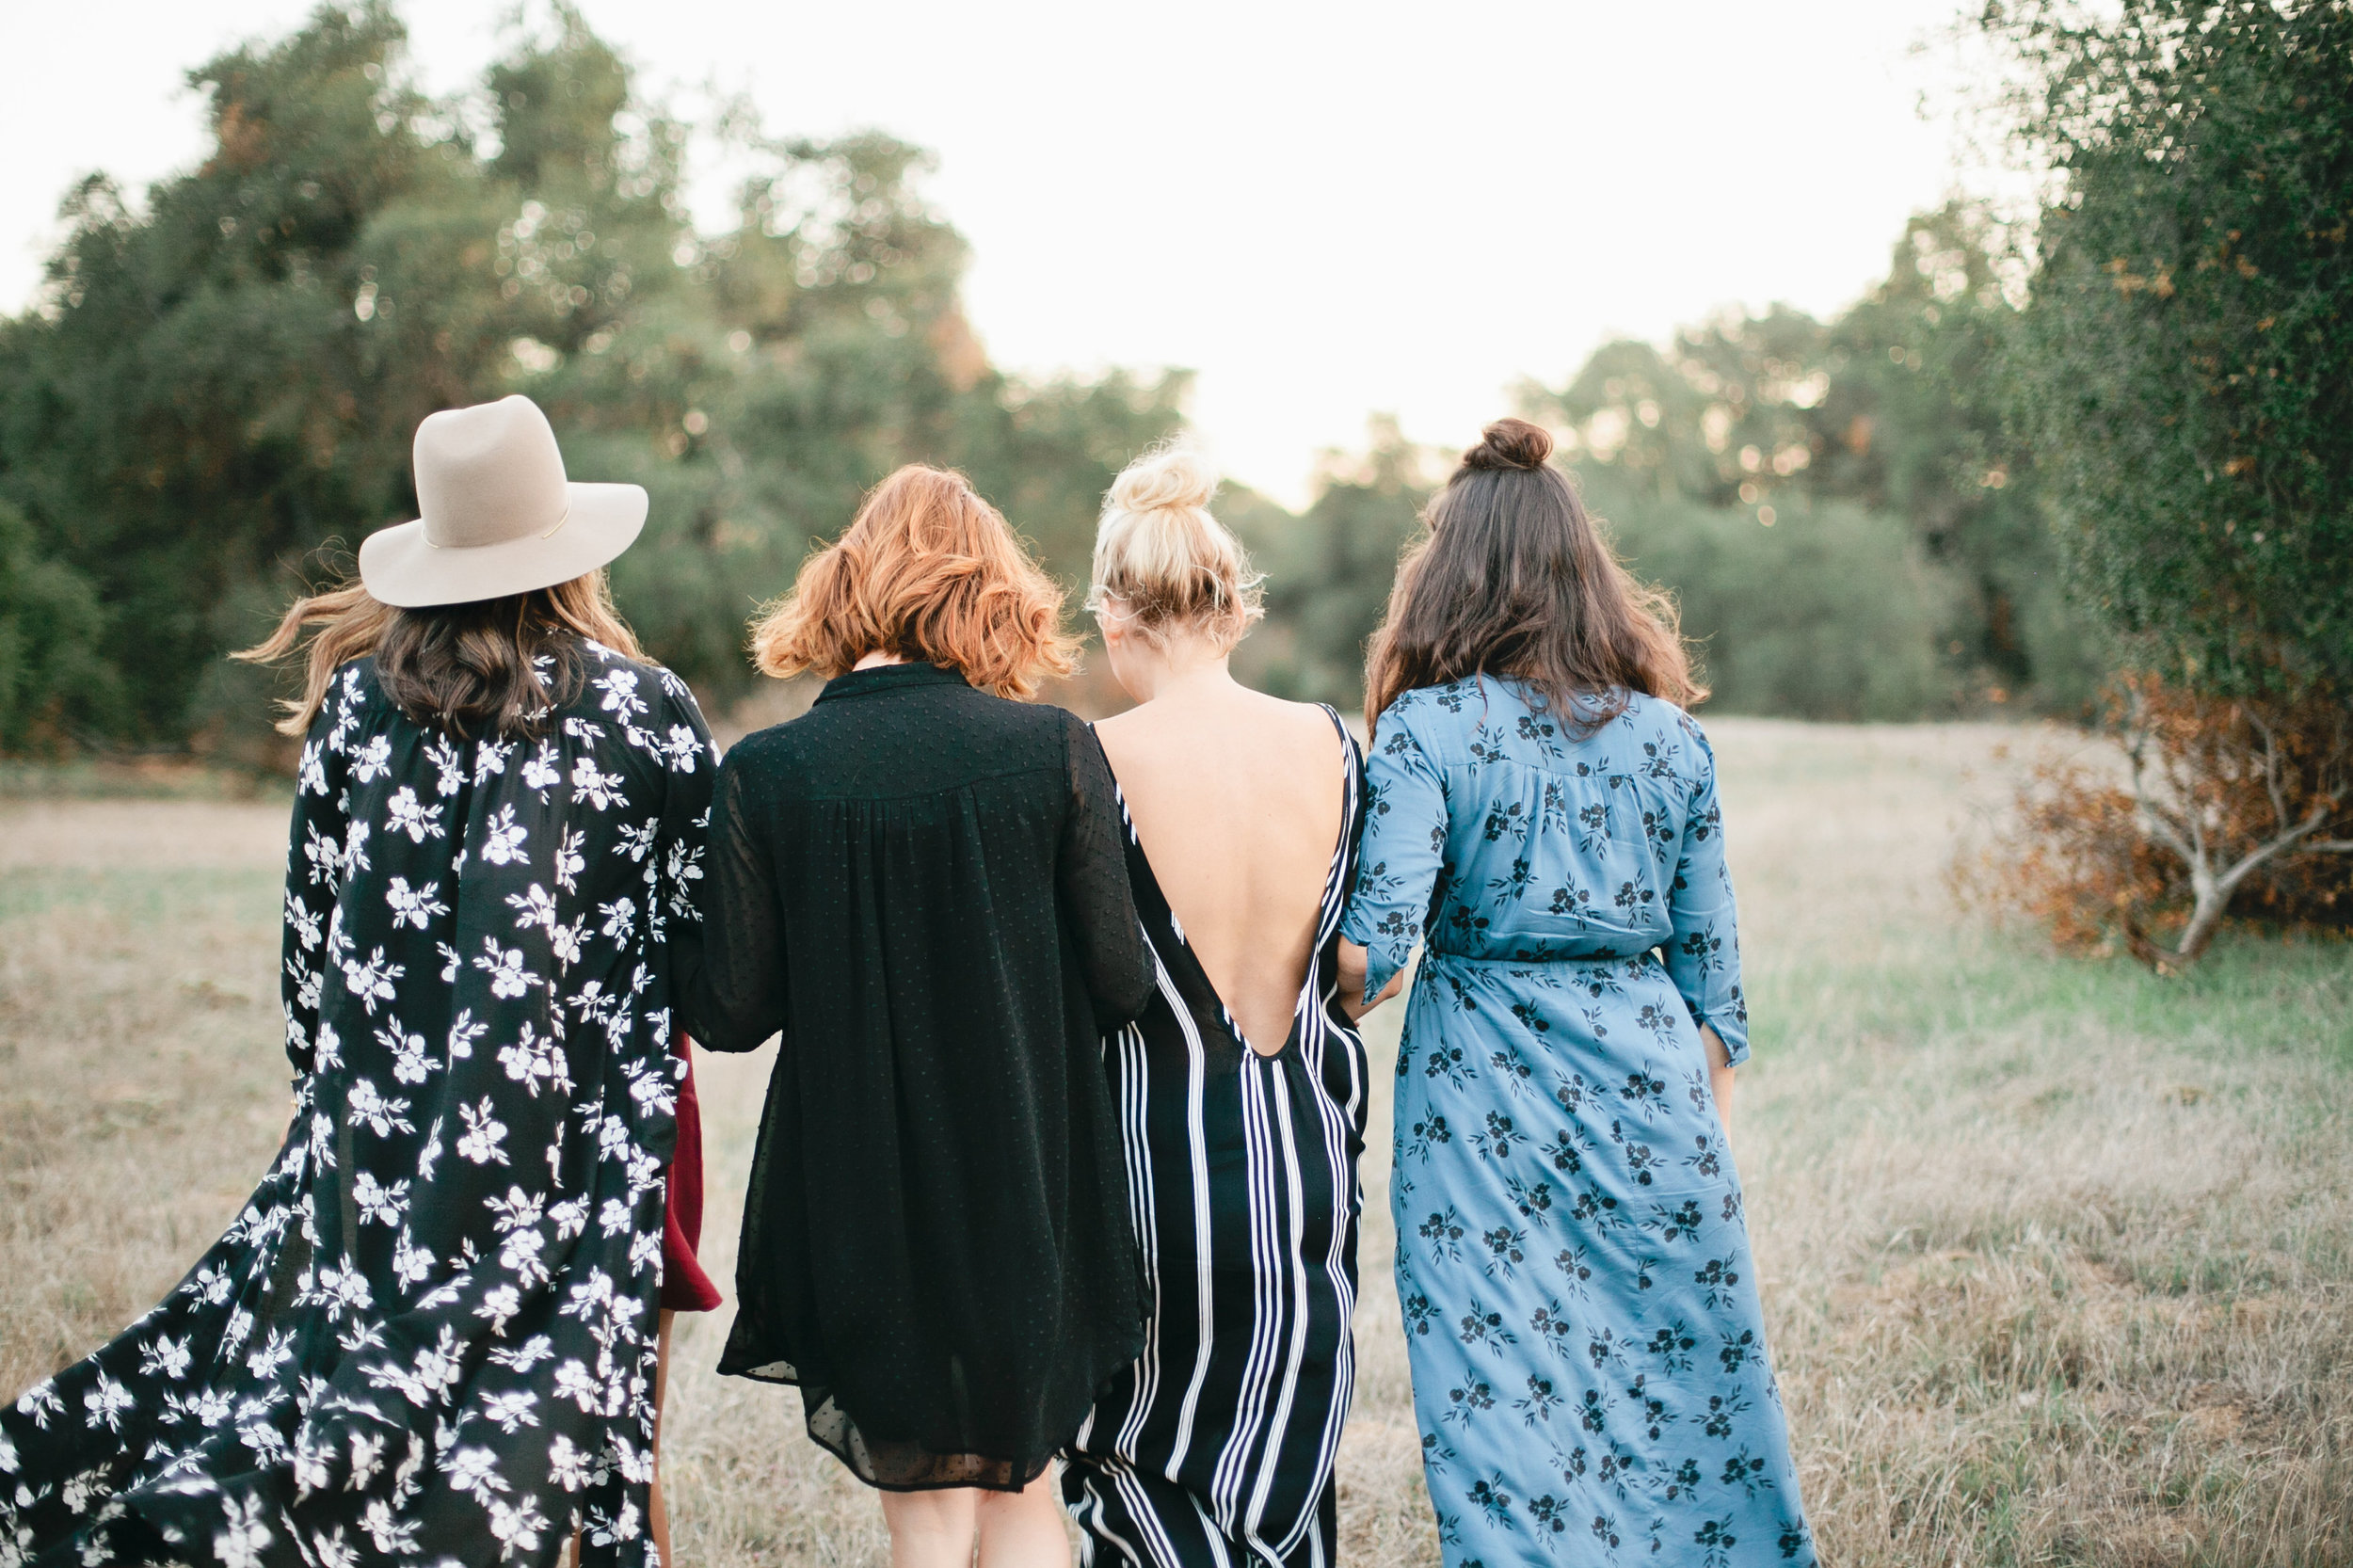 Outdoor Friendsgiving gathering